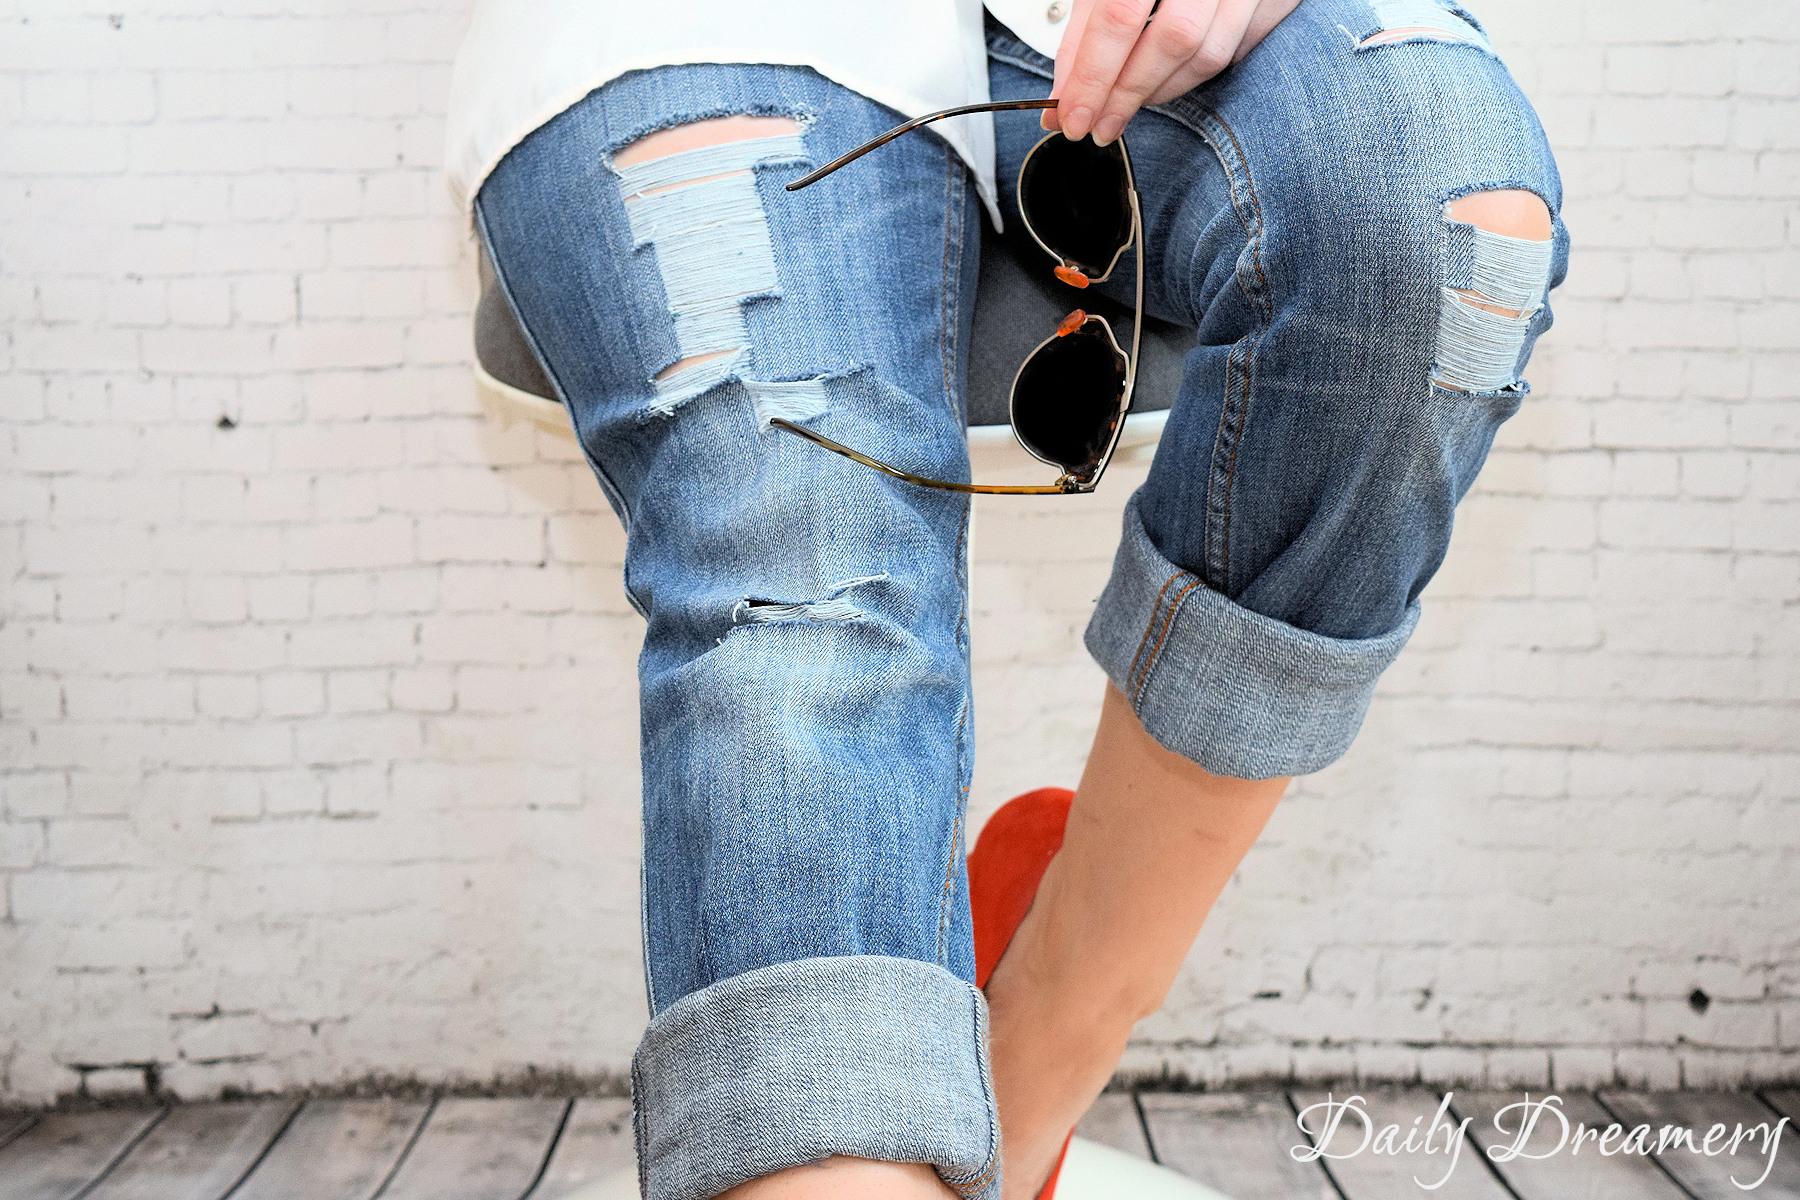 Fabelhaft Sommertrend Ripped Jeans - ganz easy selbermachen – Daily Dreamery #ZI_05